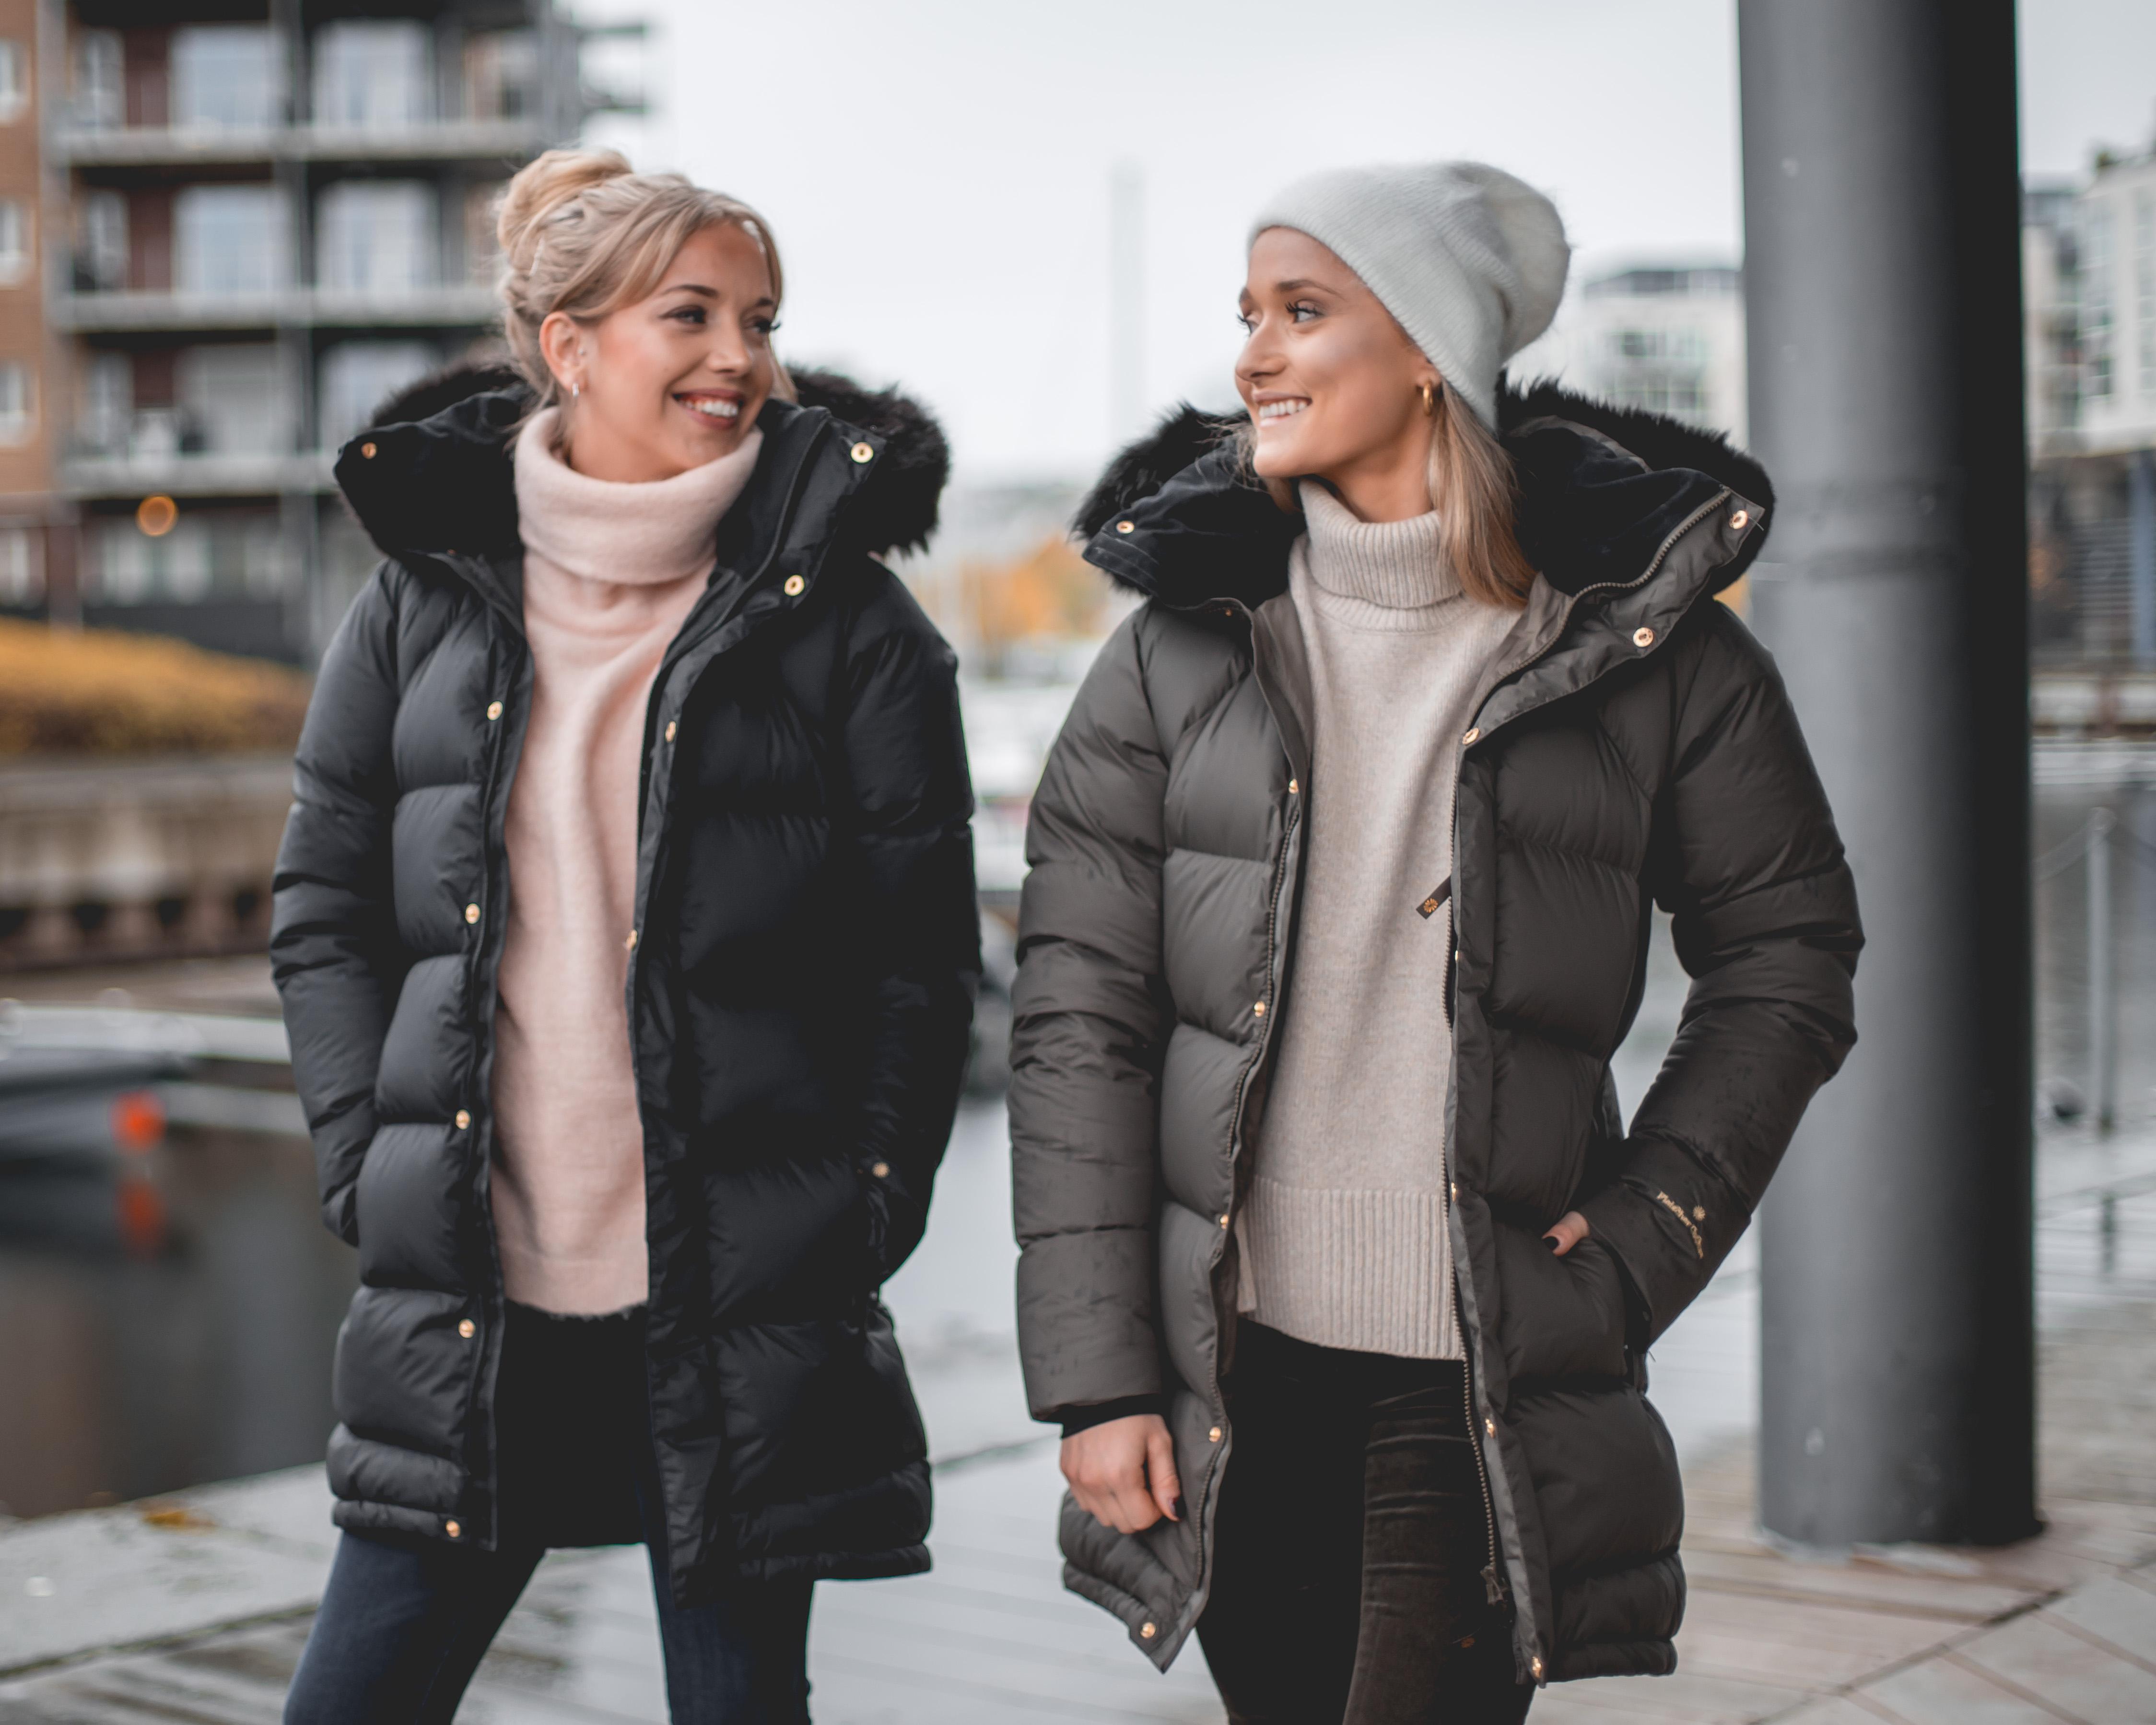 c1dec112 Lene Marie – Side 15 – Høyerblogg Trondheim | Upgrading Humans Since ...